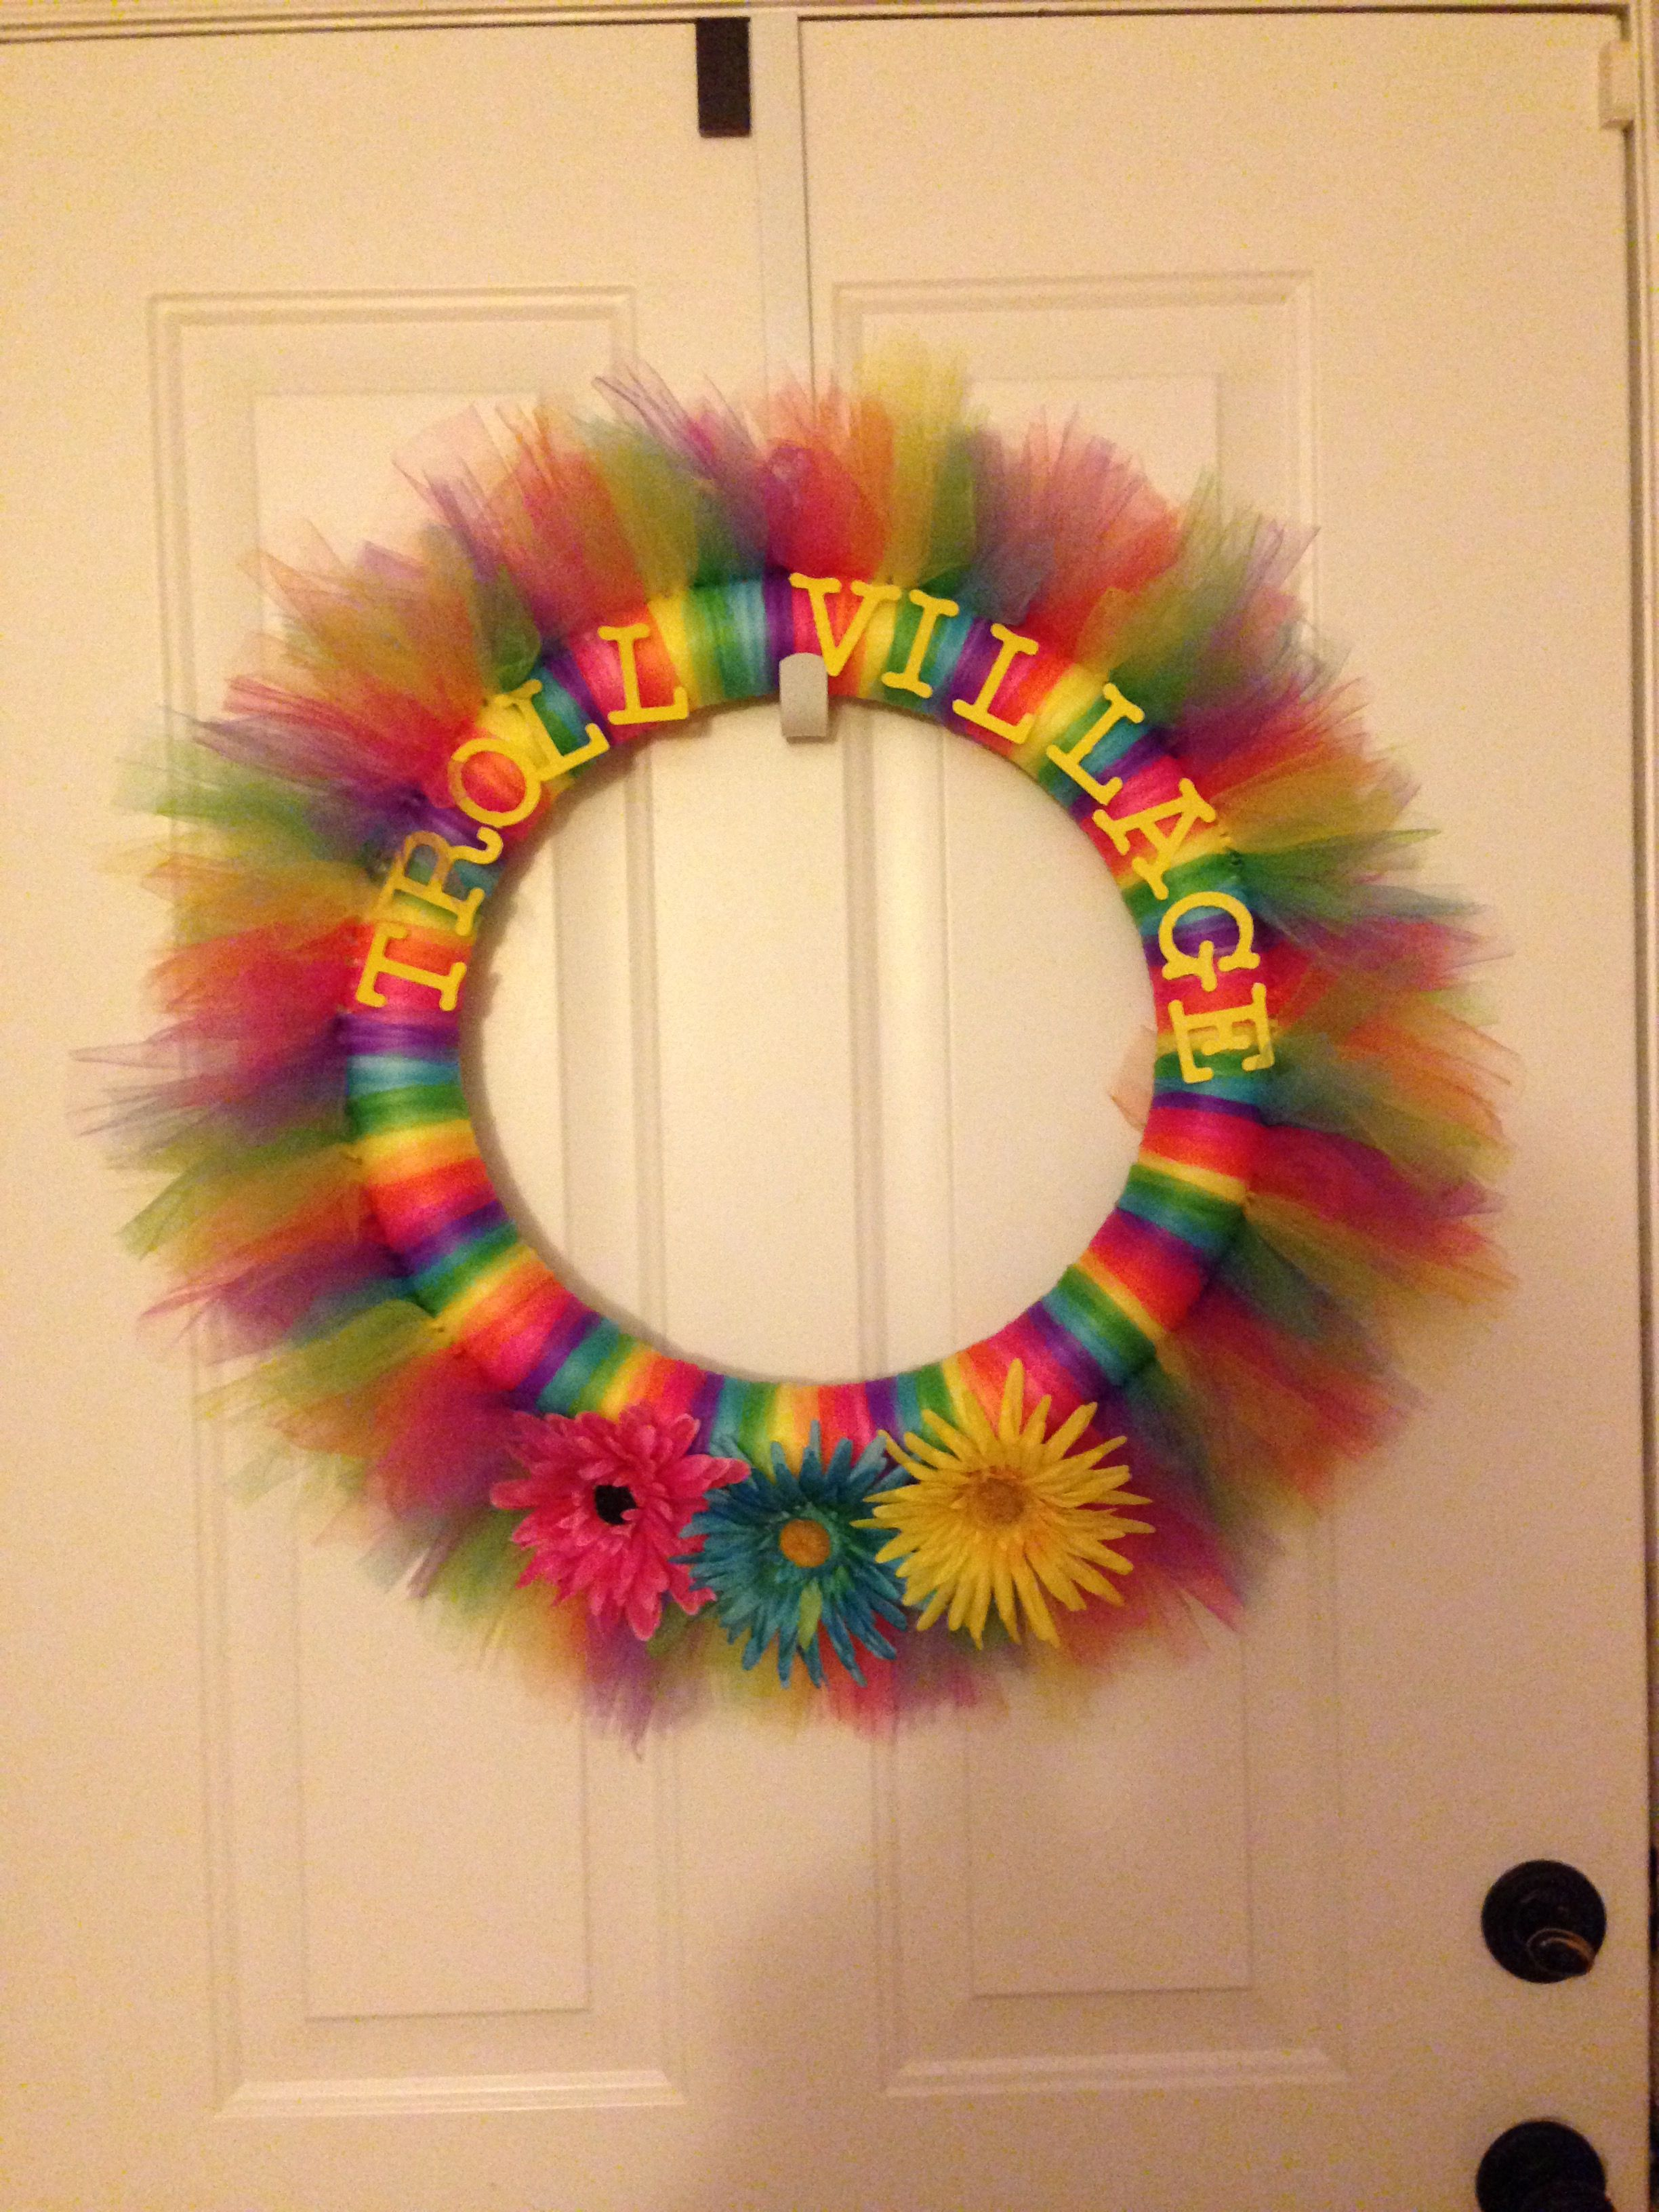 Girls Trolls Bedroom: Cumpleaños, Fiesta, Cumple